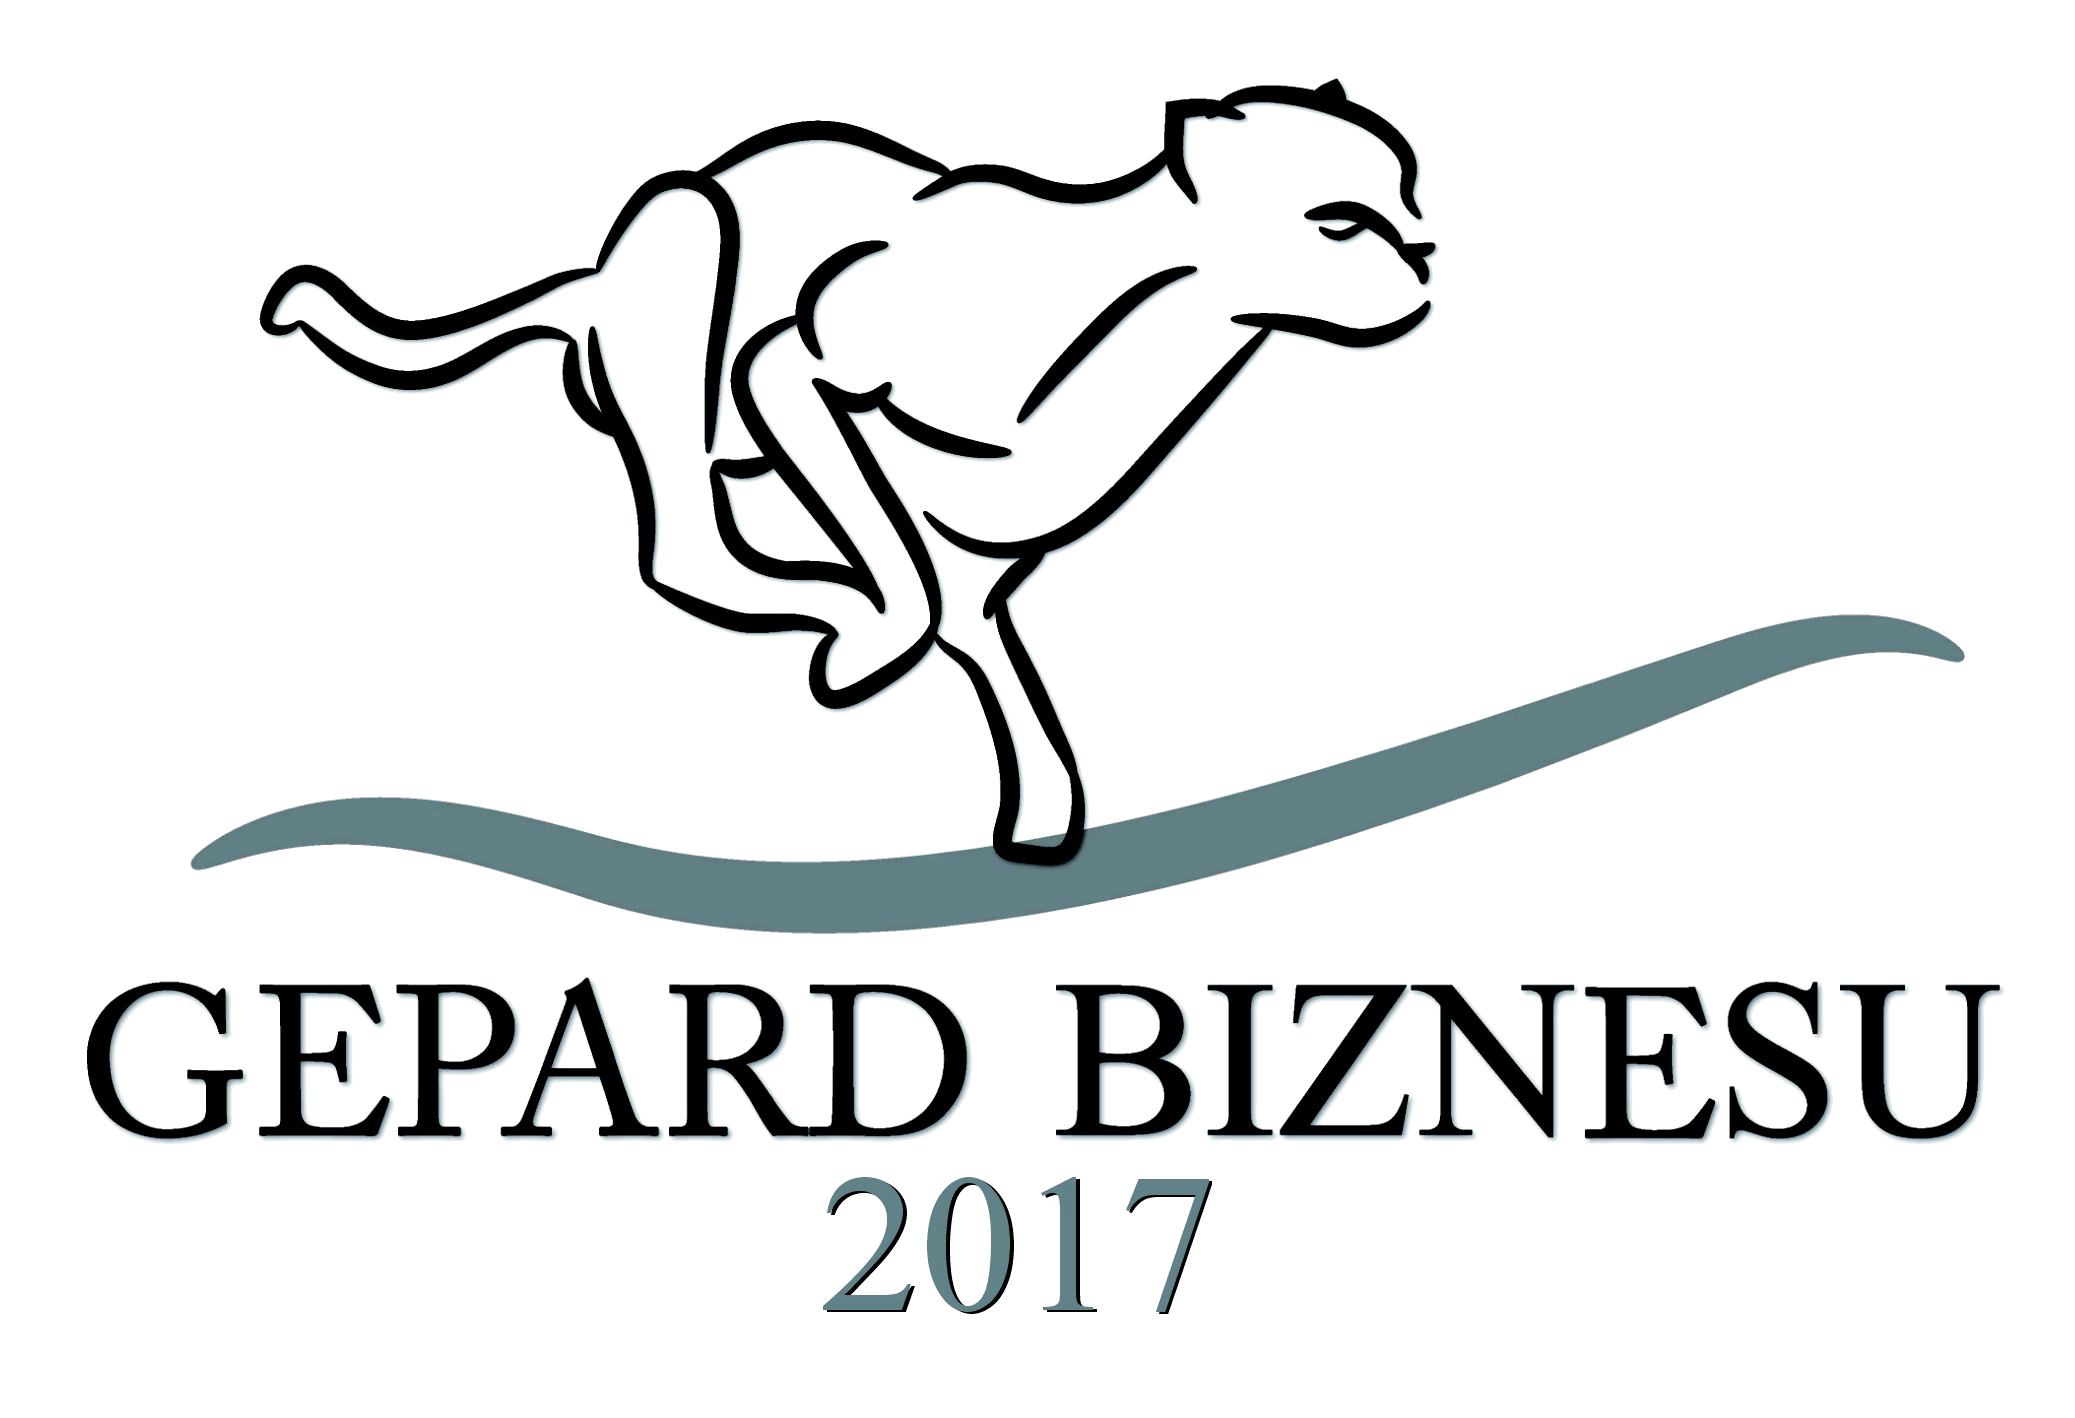 Gepard Biznesu 2017